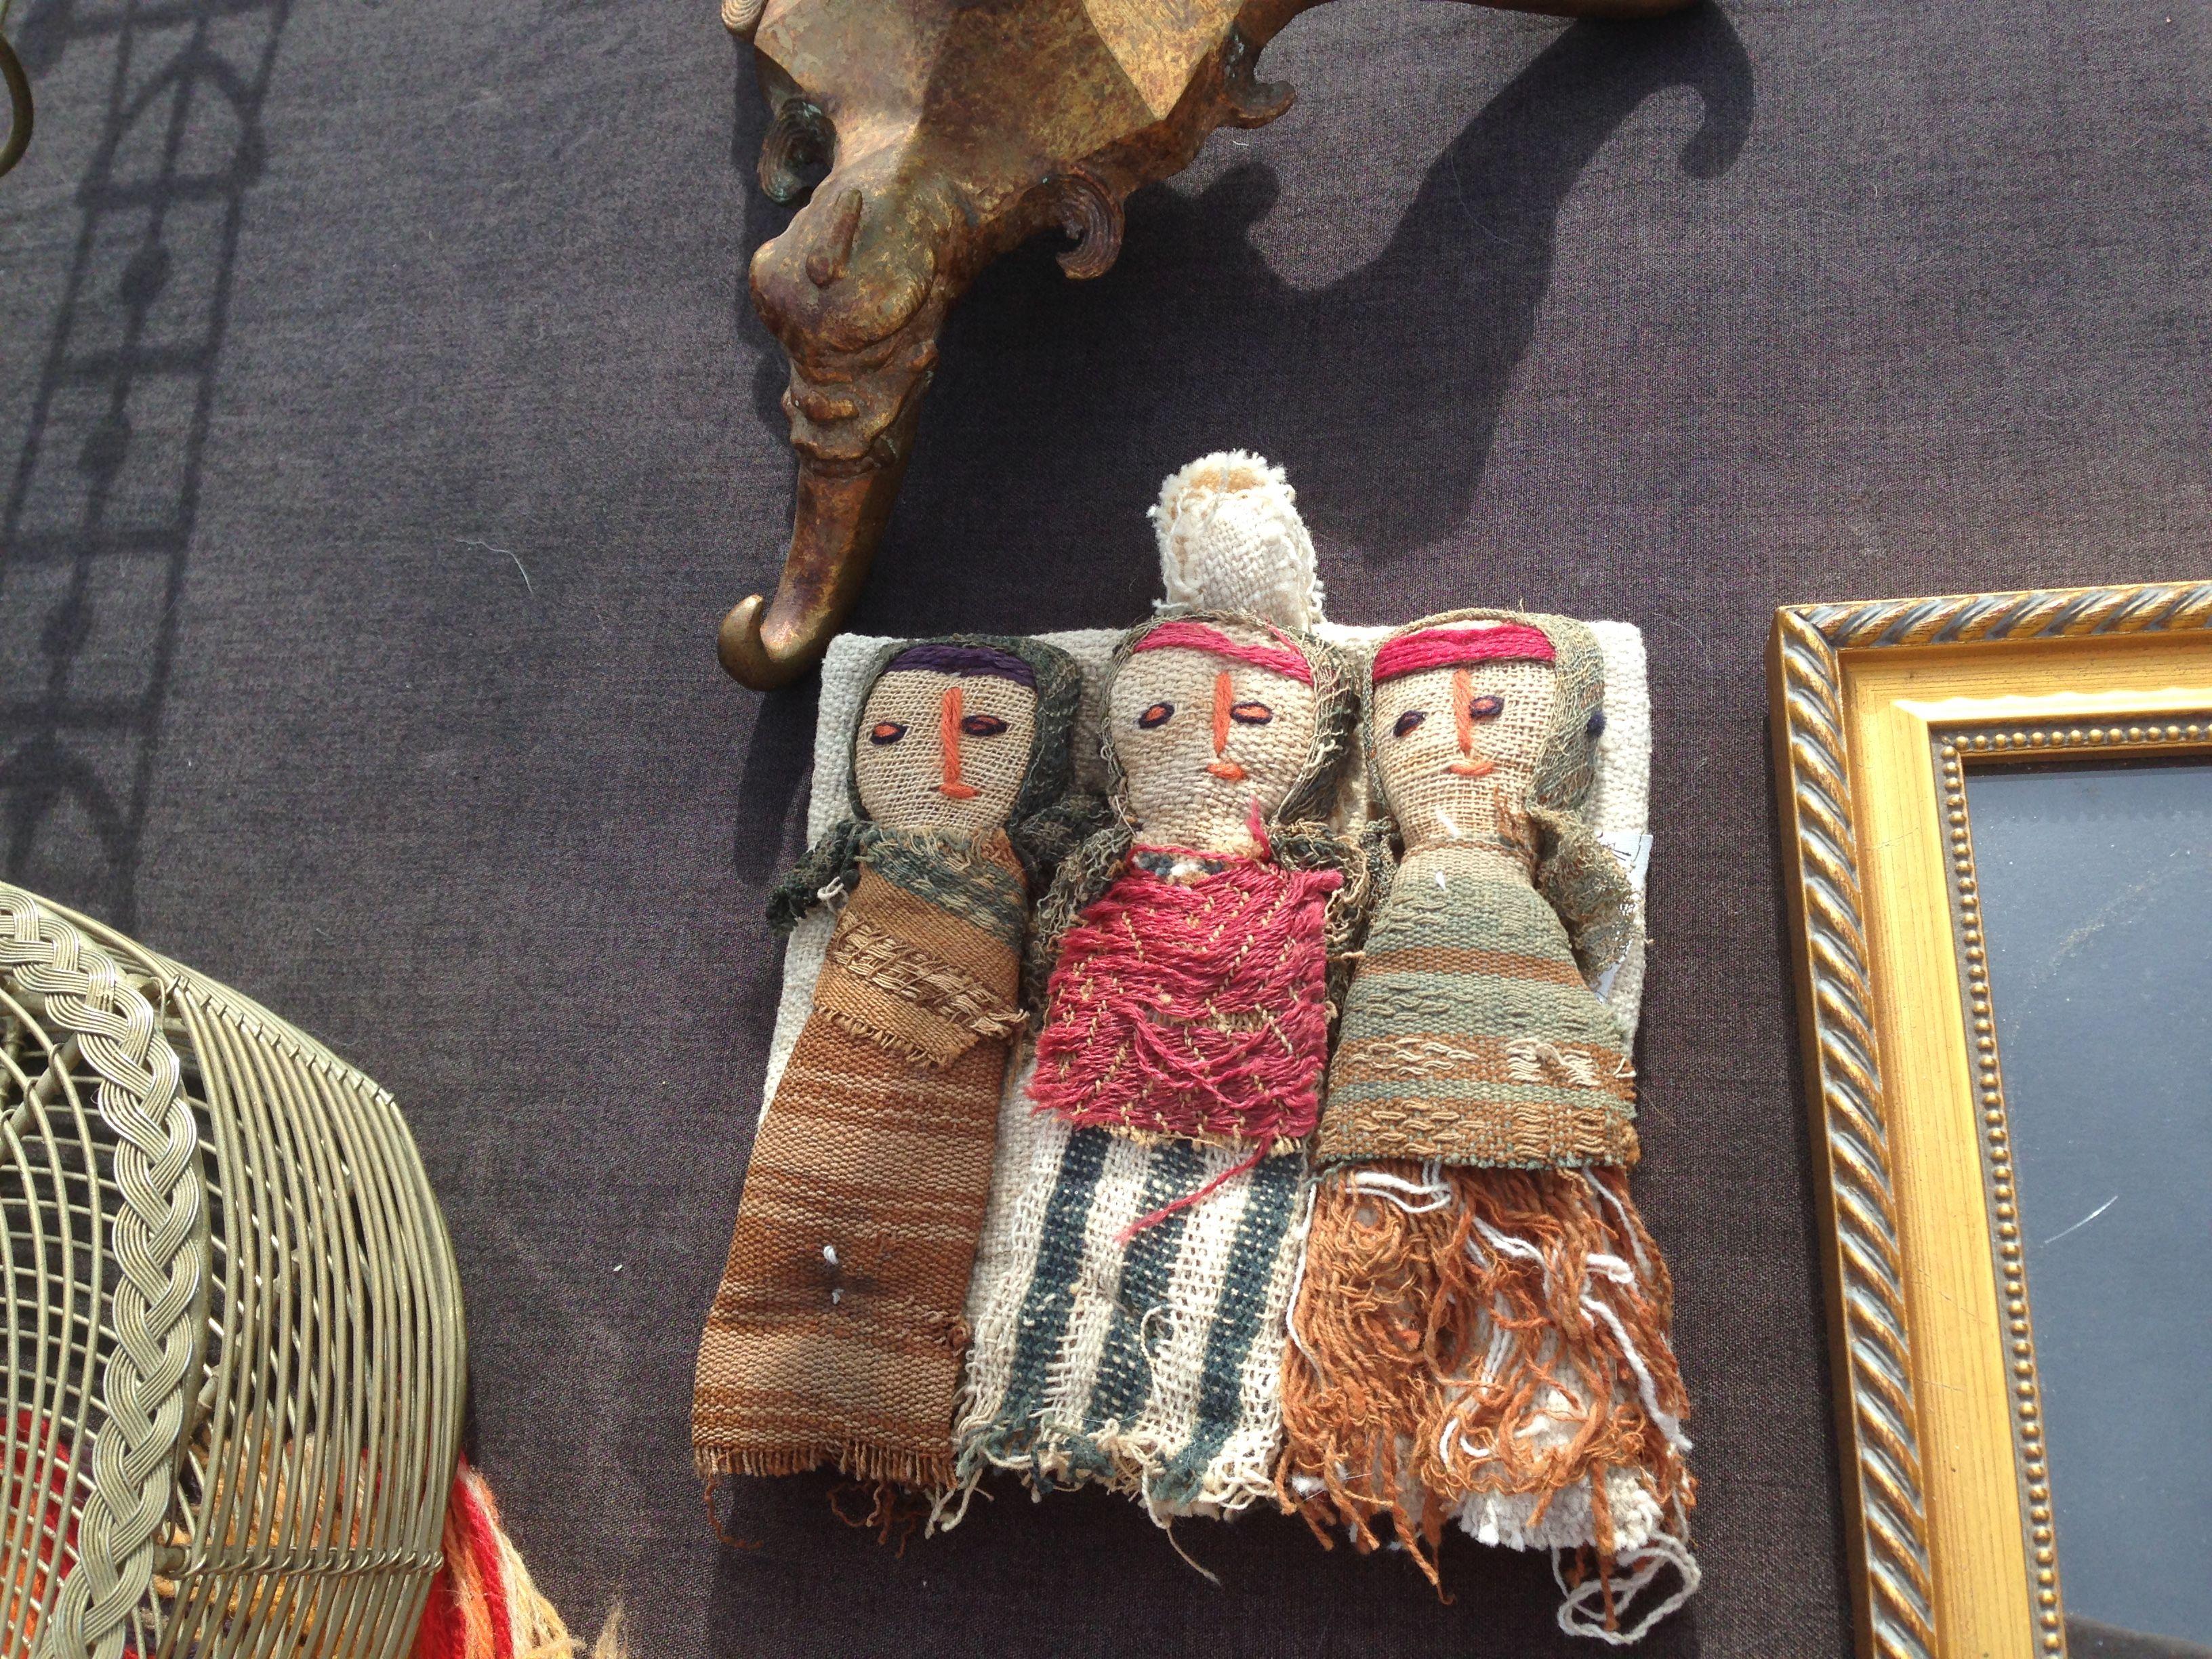 3 wrapped burlap dolls native american style rose bowl pasadena calif antique swap meet 11 2014. Black Bedroom Furniture Sets. Home Design Ideas